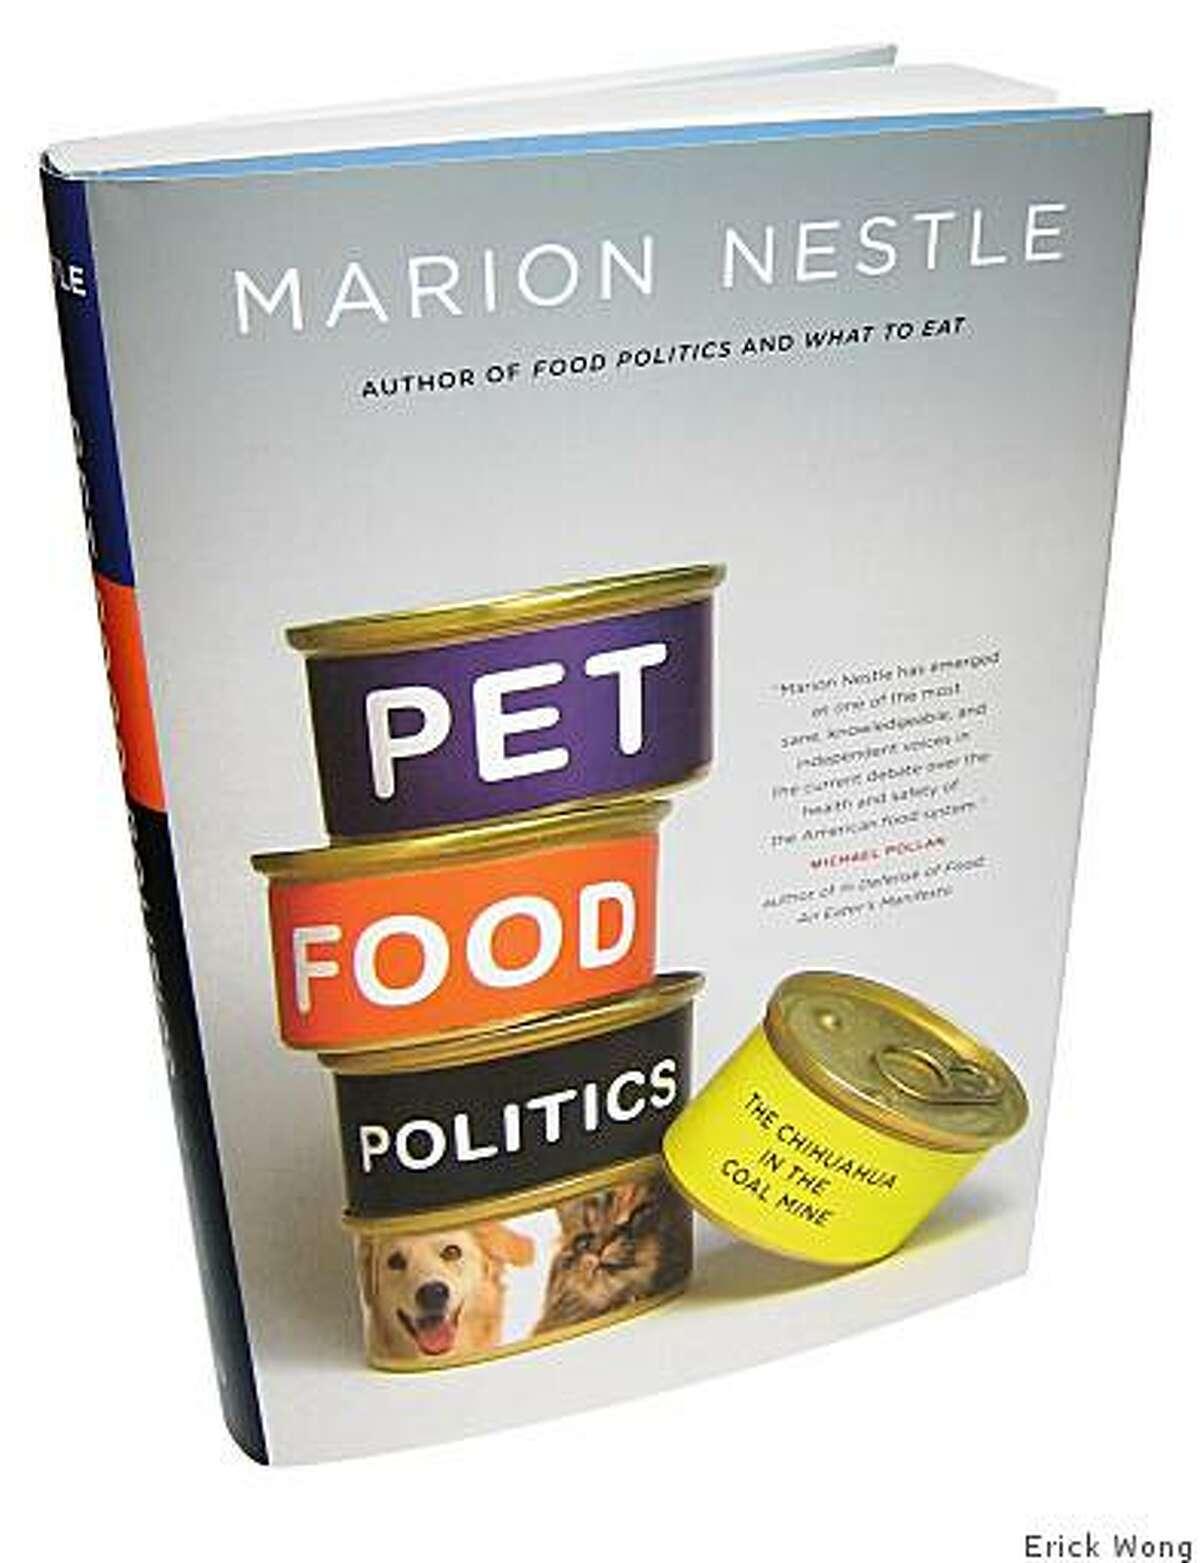 Pet Food Politics by Marion Nestle